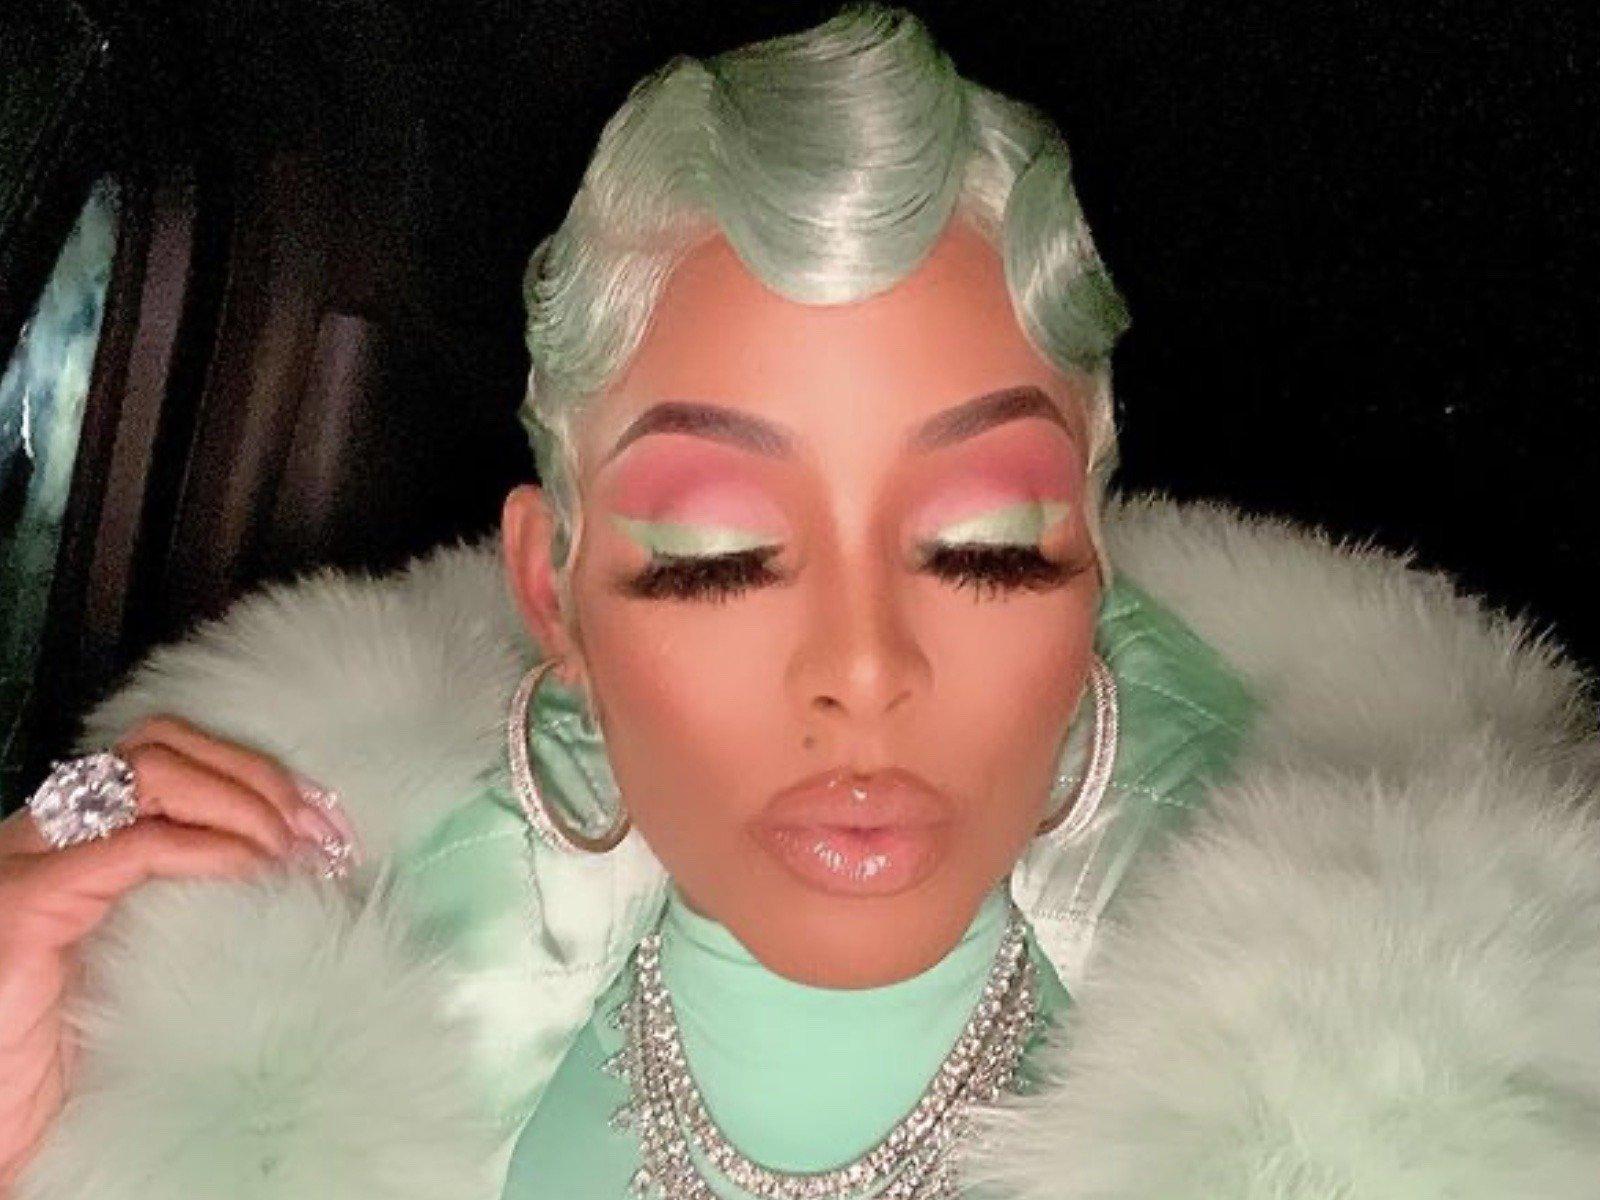 Keyshia Ka'oir: Gucci Mane Wife's 5 Most Colorful Hairstyles  SOHH.com